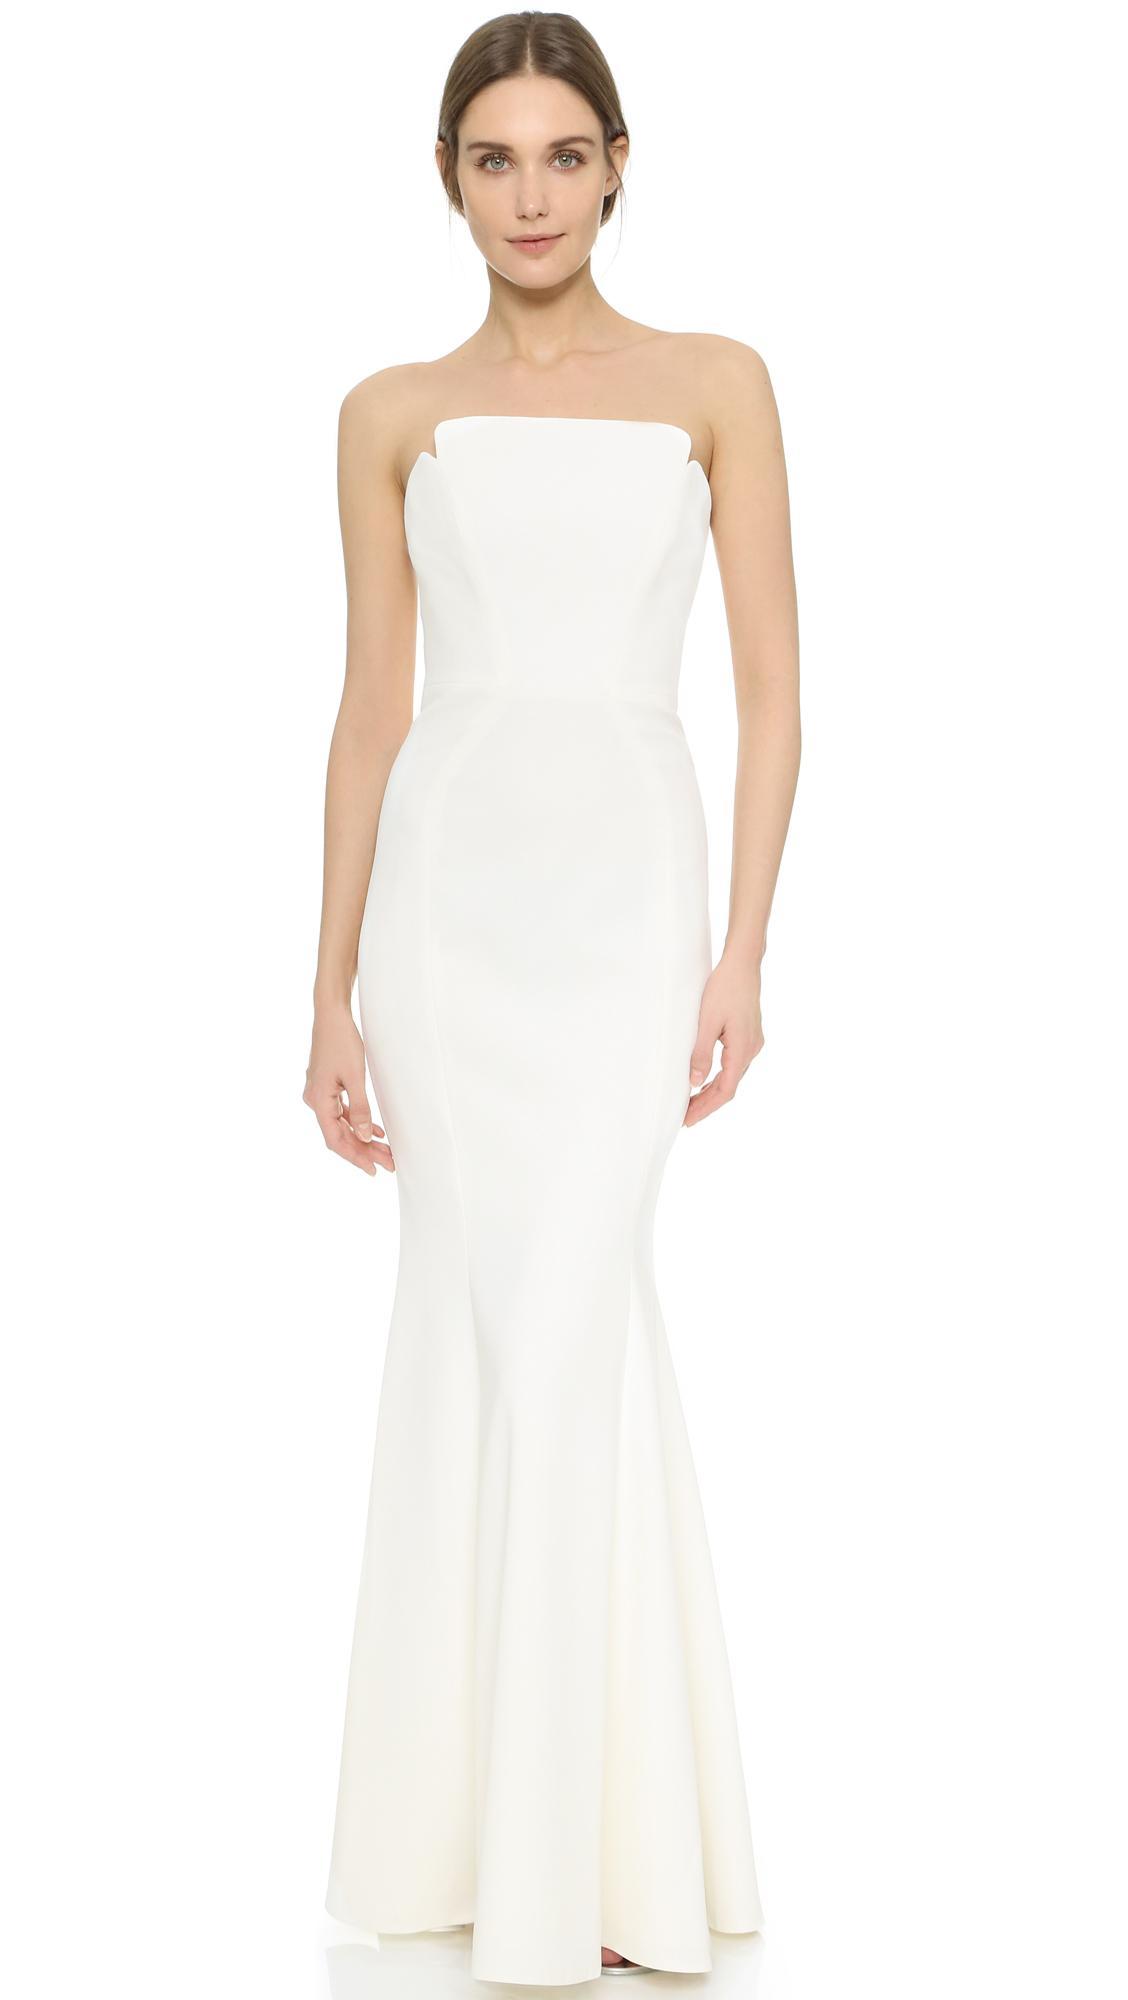 e683e5a6ea597 JILL Jill Stuart Strapless Maxi Dress in White - Lyst